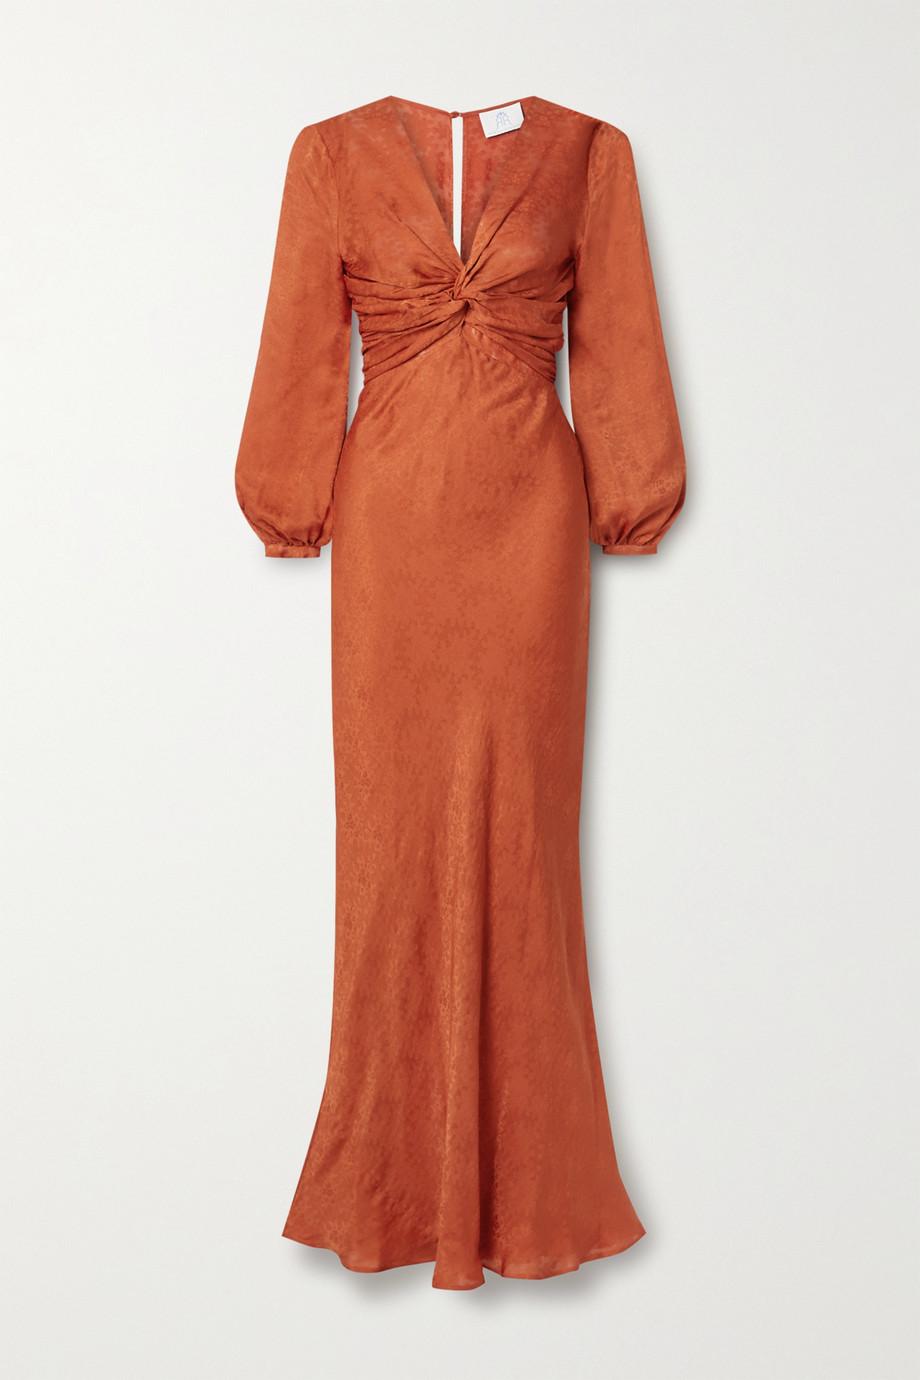 Rebecca de Ravenel Sienna knotted silk-satin jacquard gown